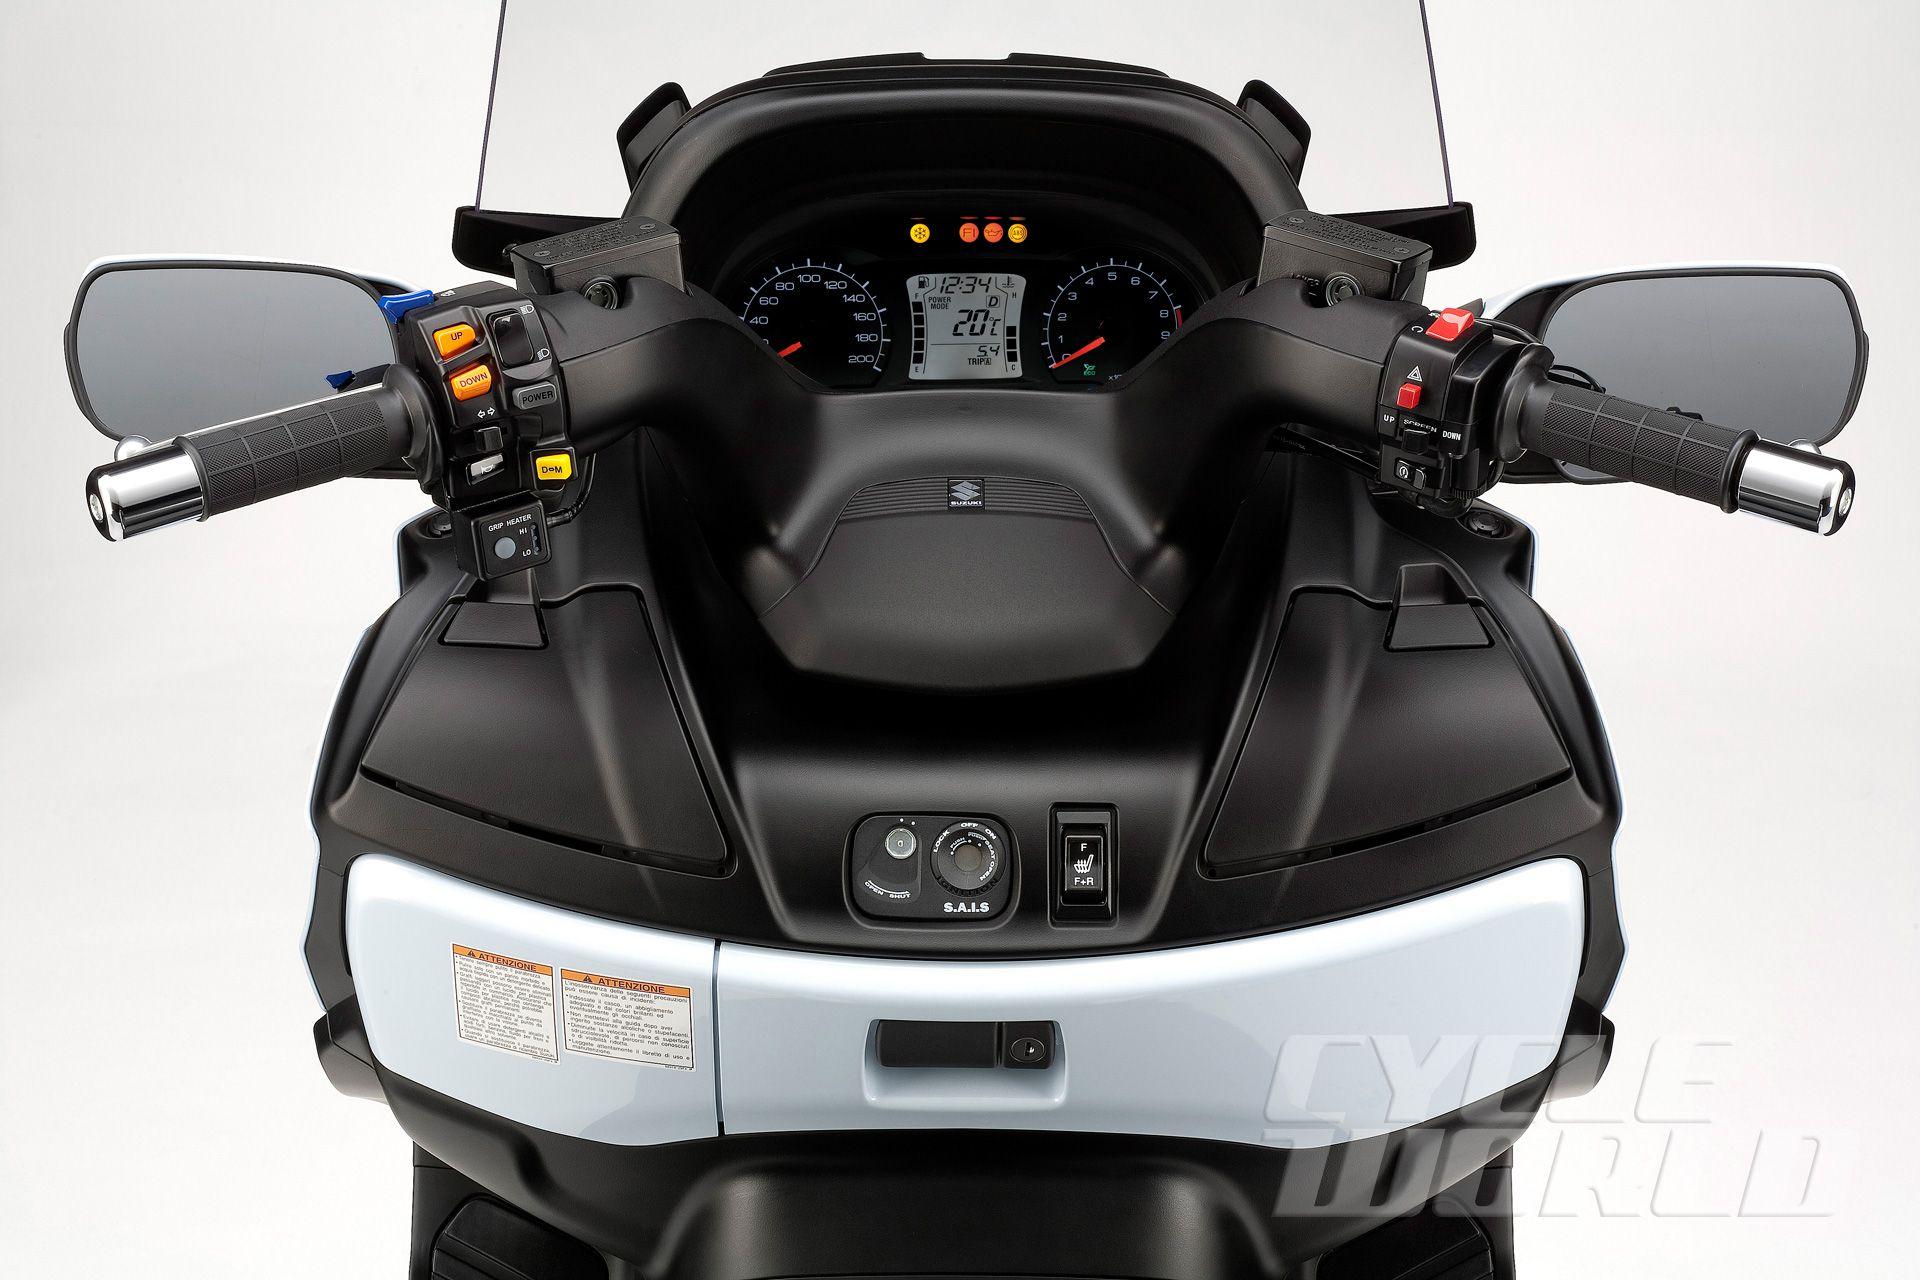 2012 Suzuki Burgman 650 Executive For Sale